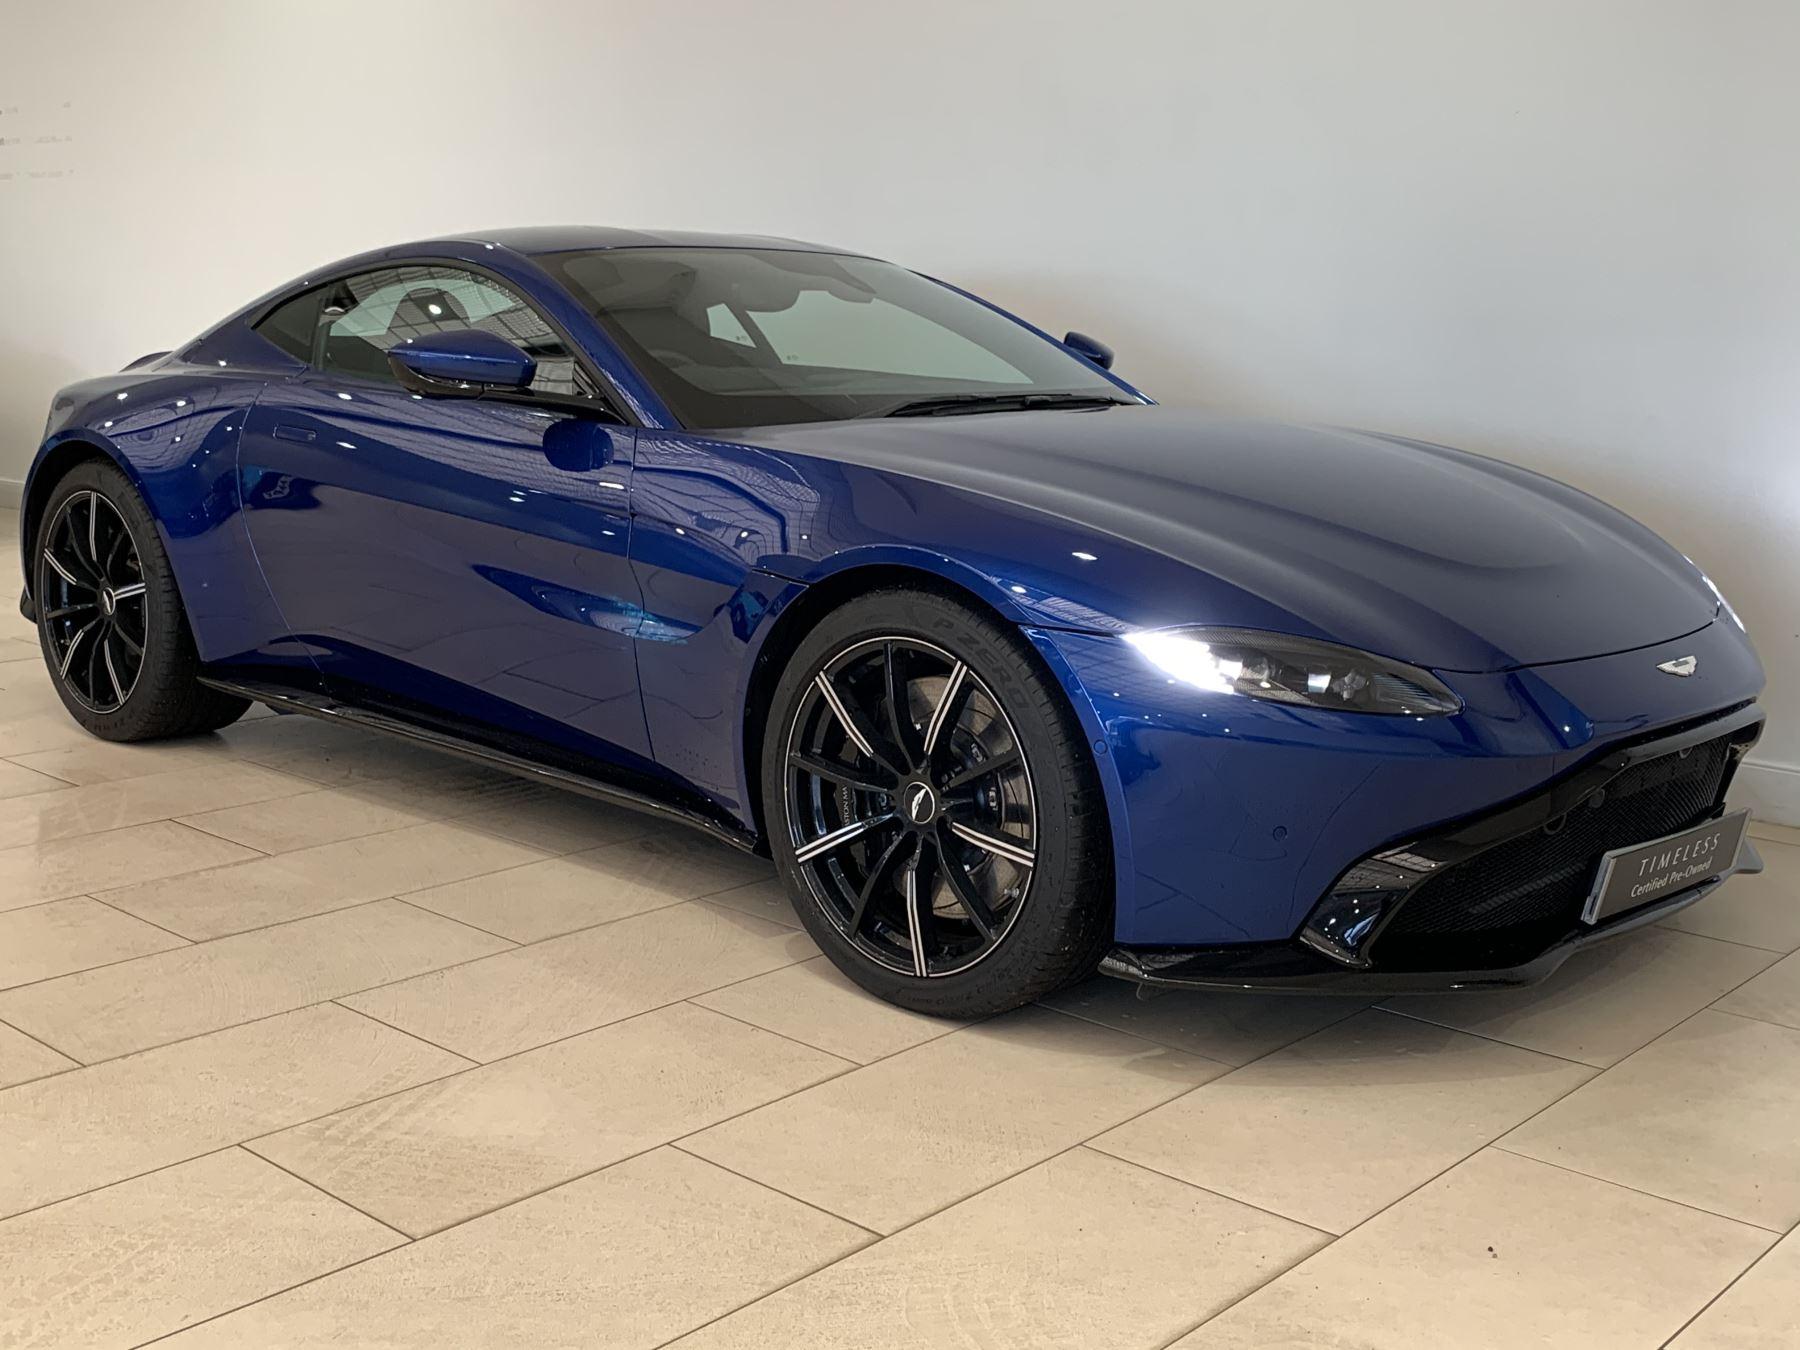 Aston Martin New Vantage 2dr ZF 8 Speed image 6